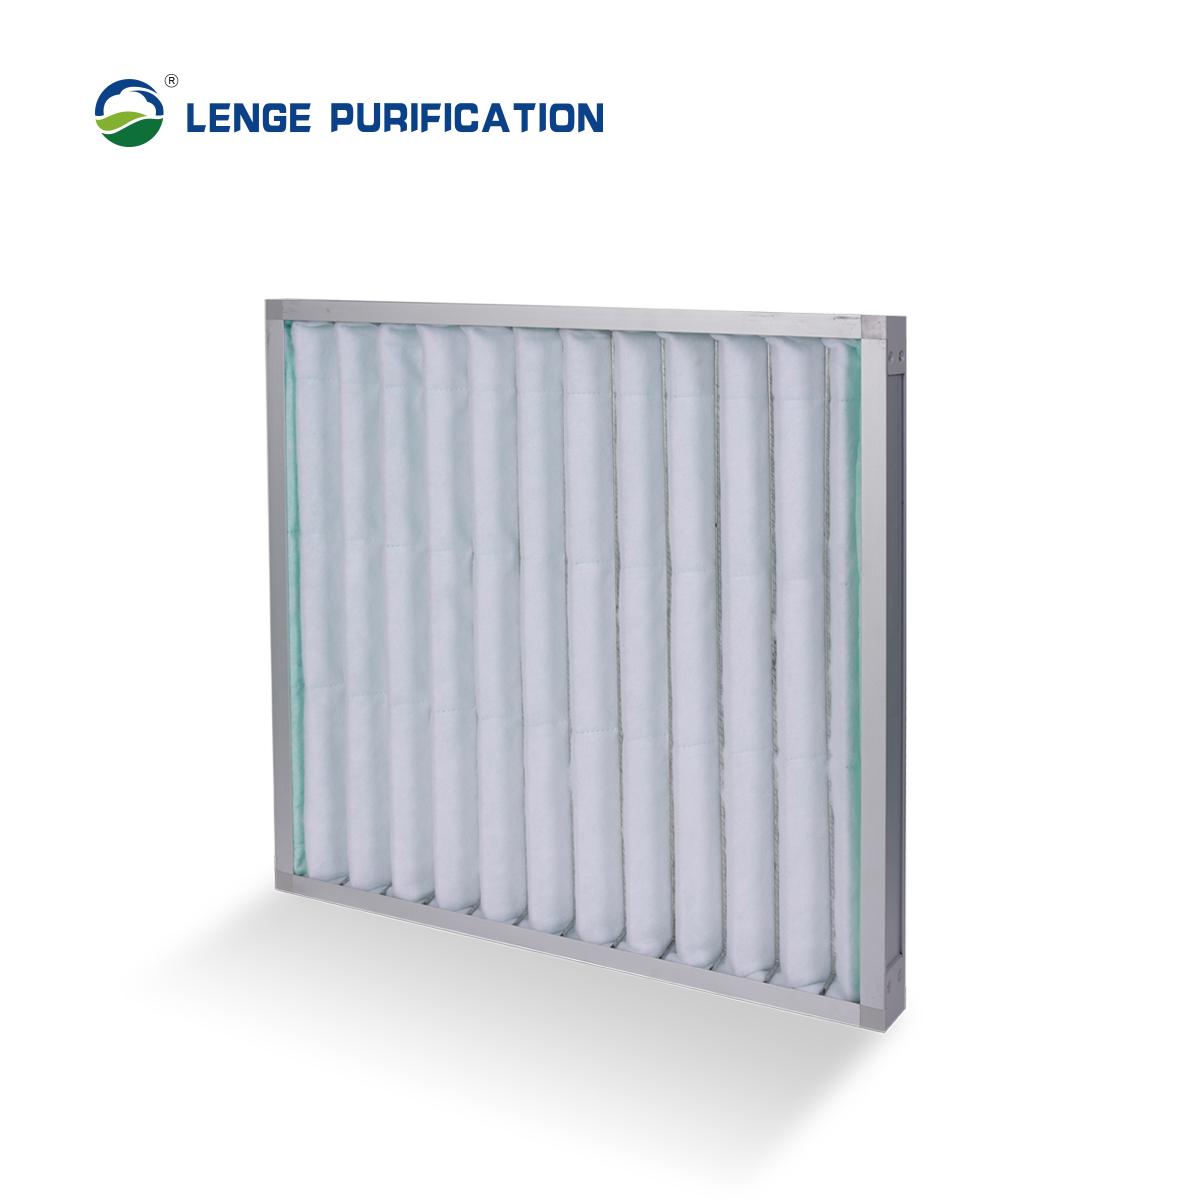 LENGE Panel Air Filter